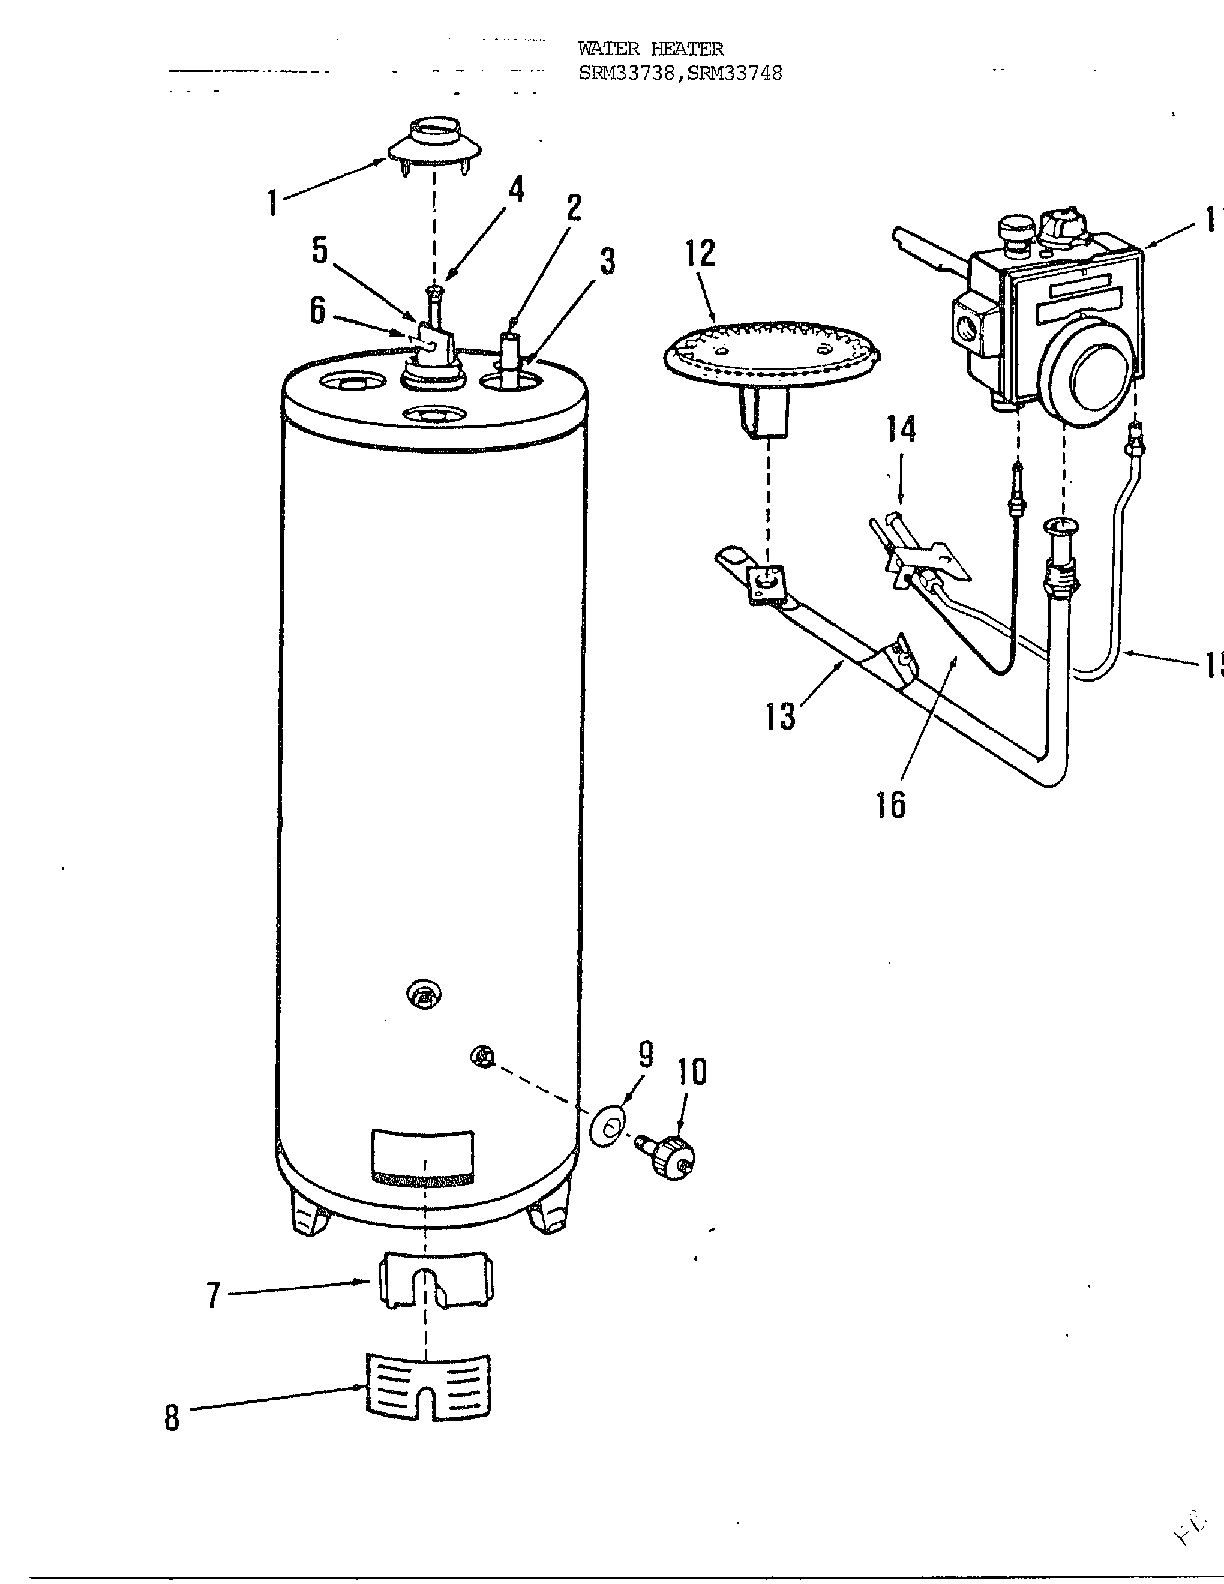 Rheem model 33738 water heater, gas genuine parts